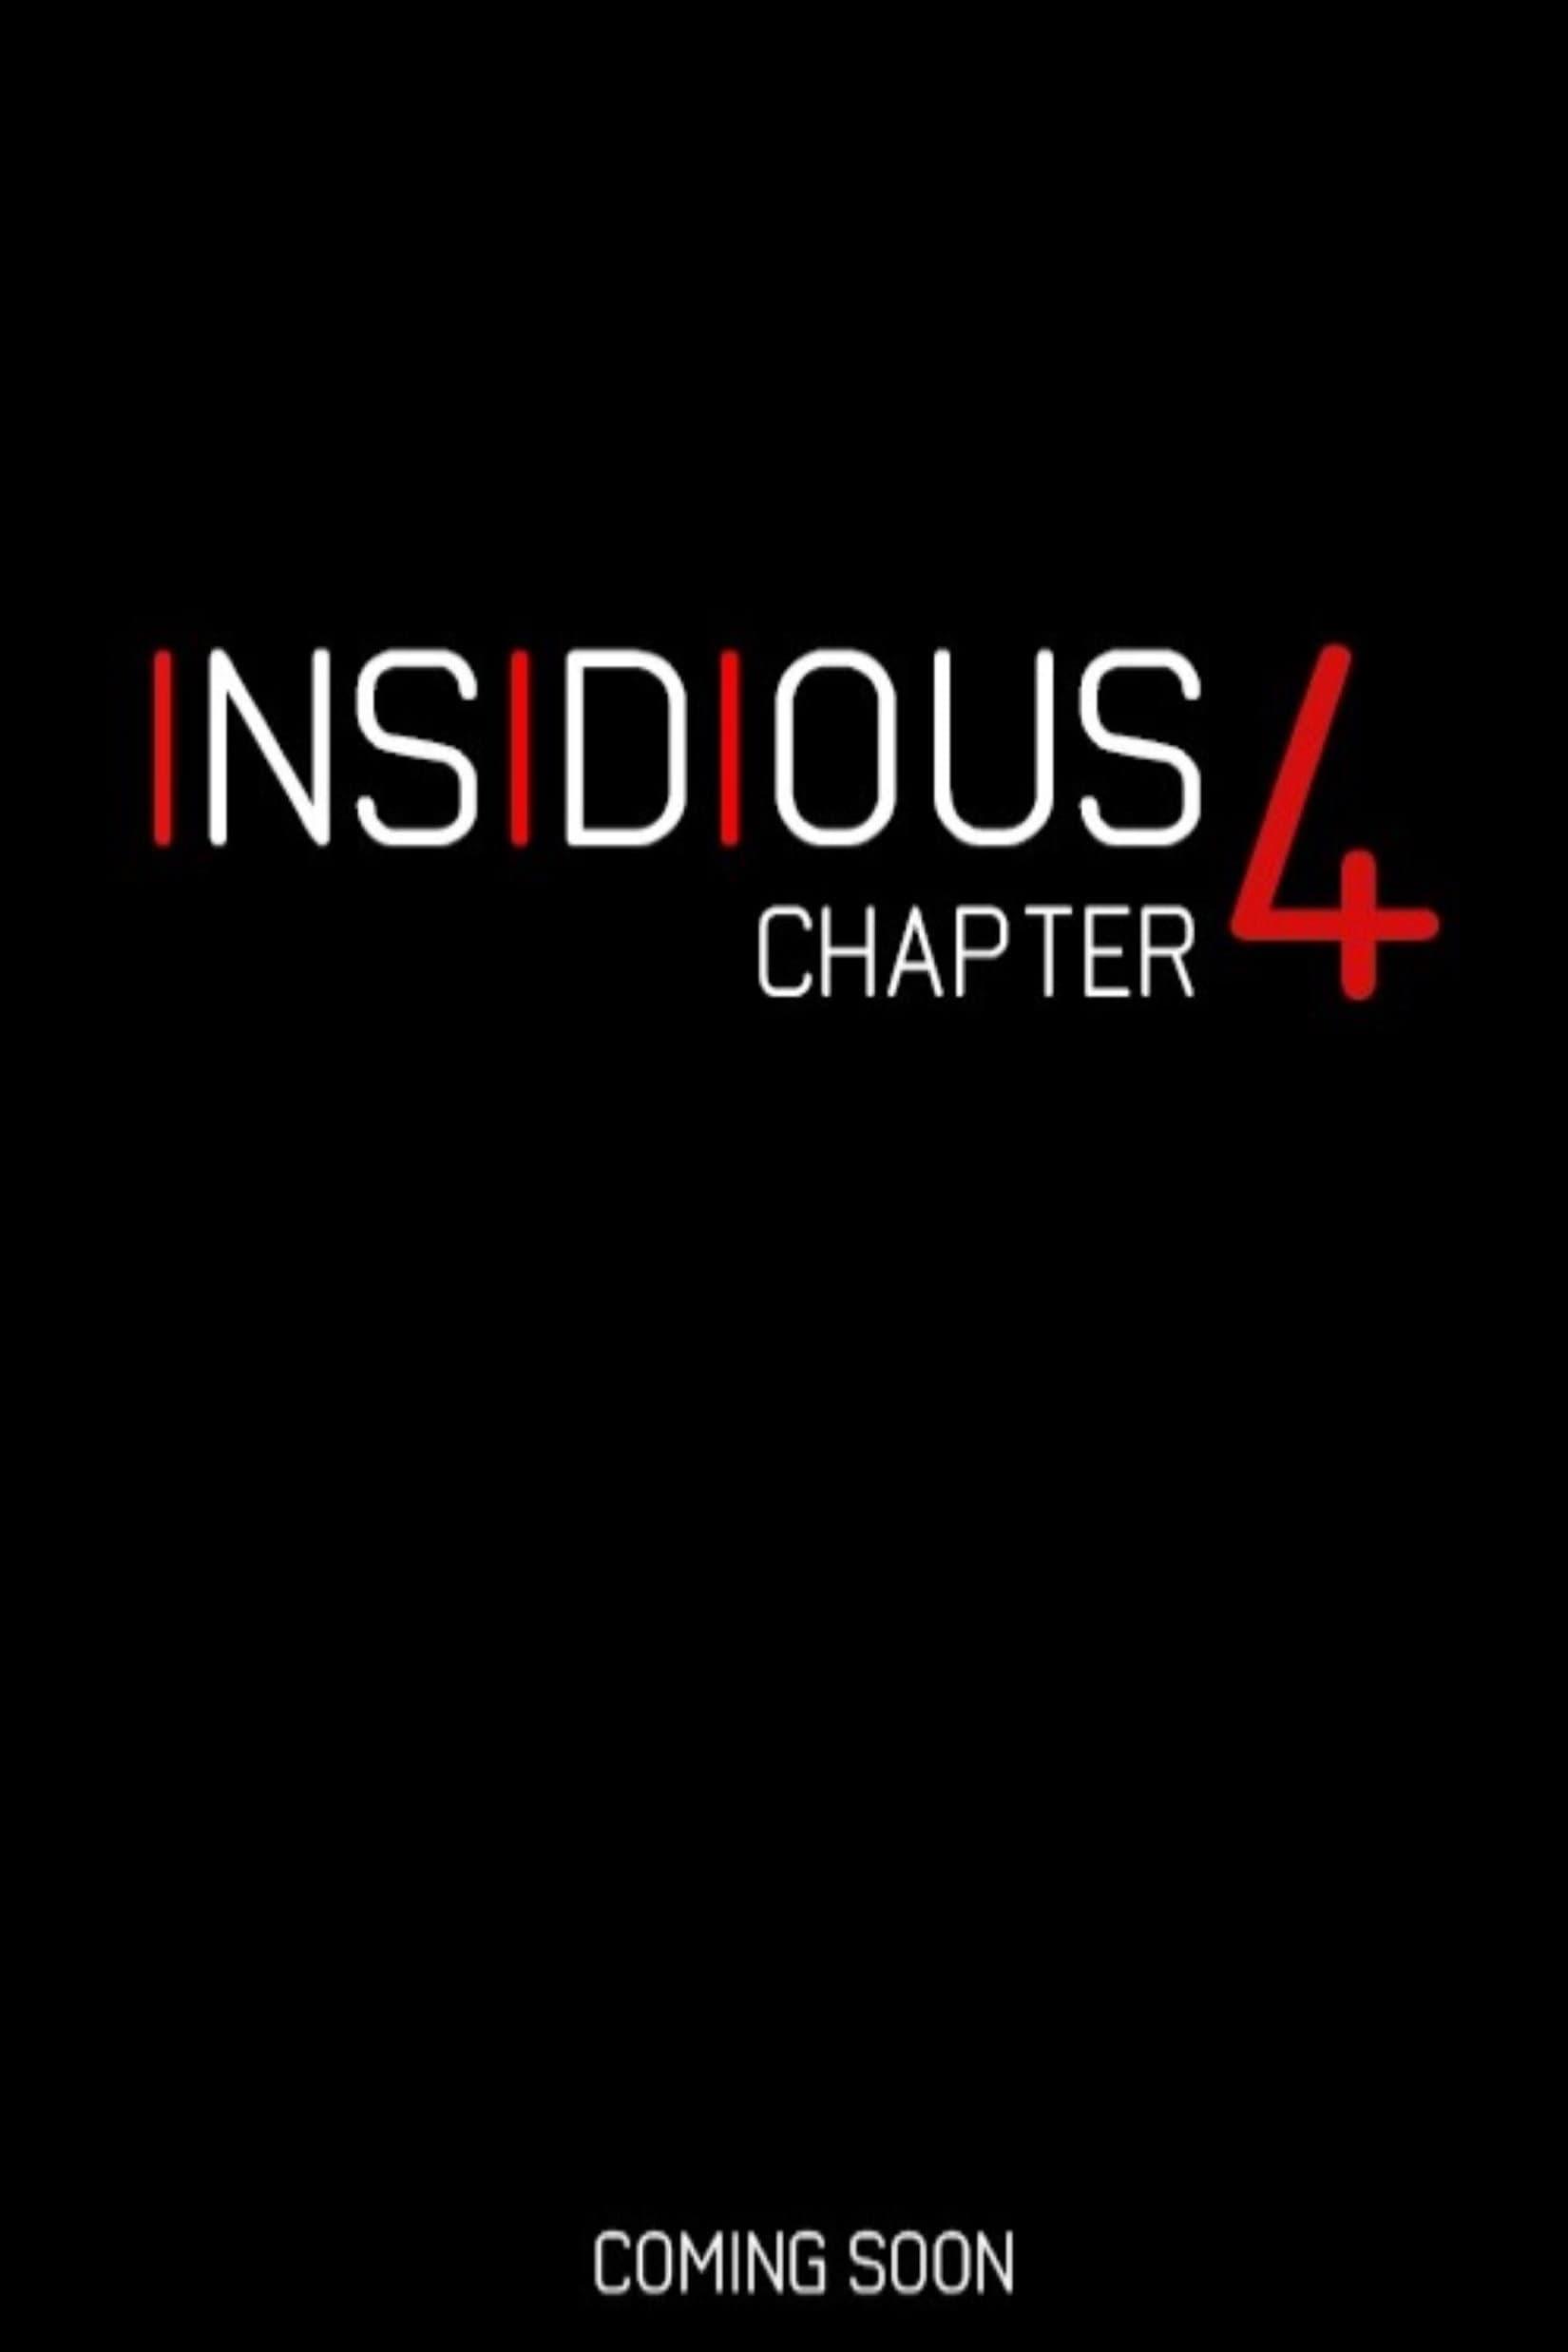 Insidious: Chapter 4